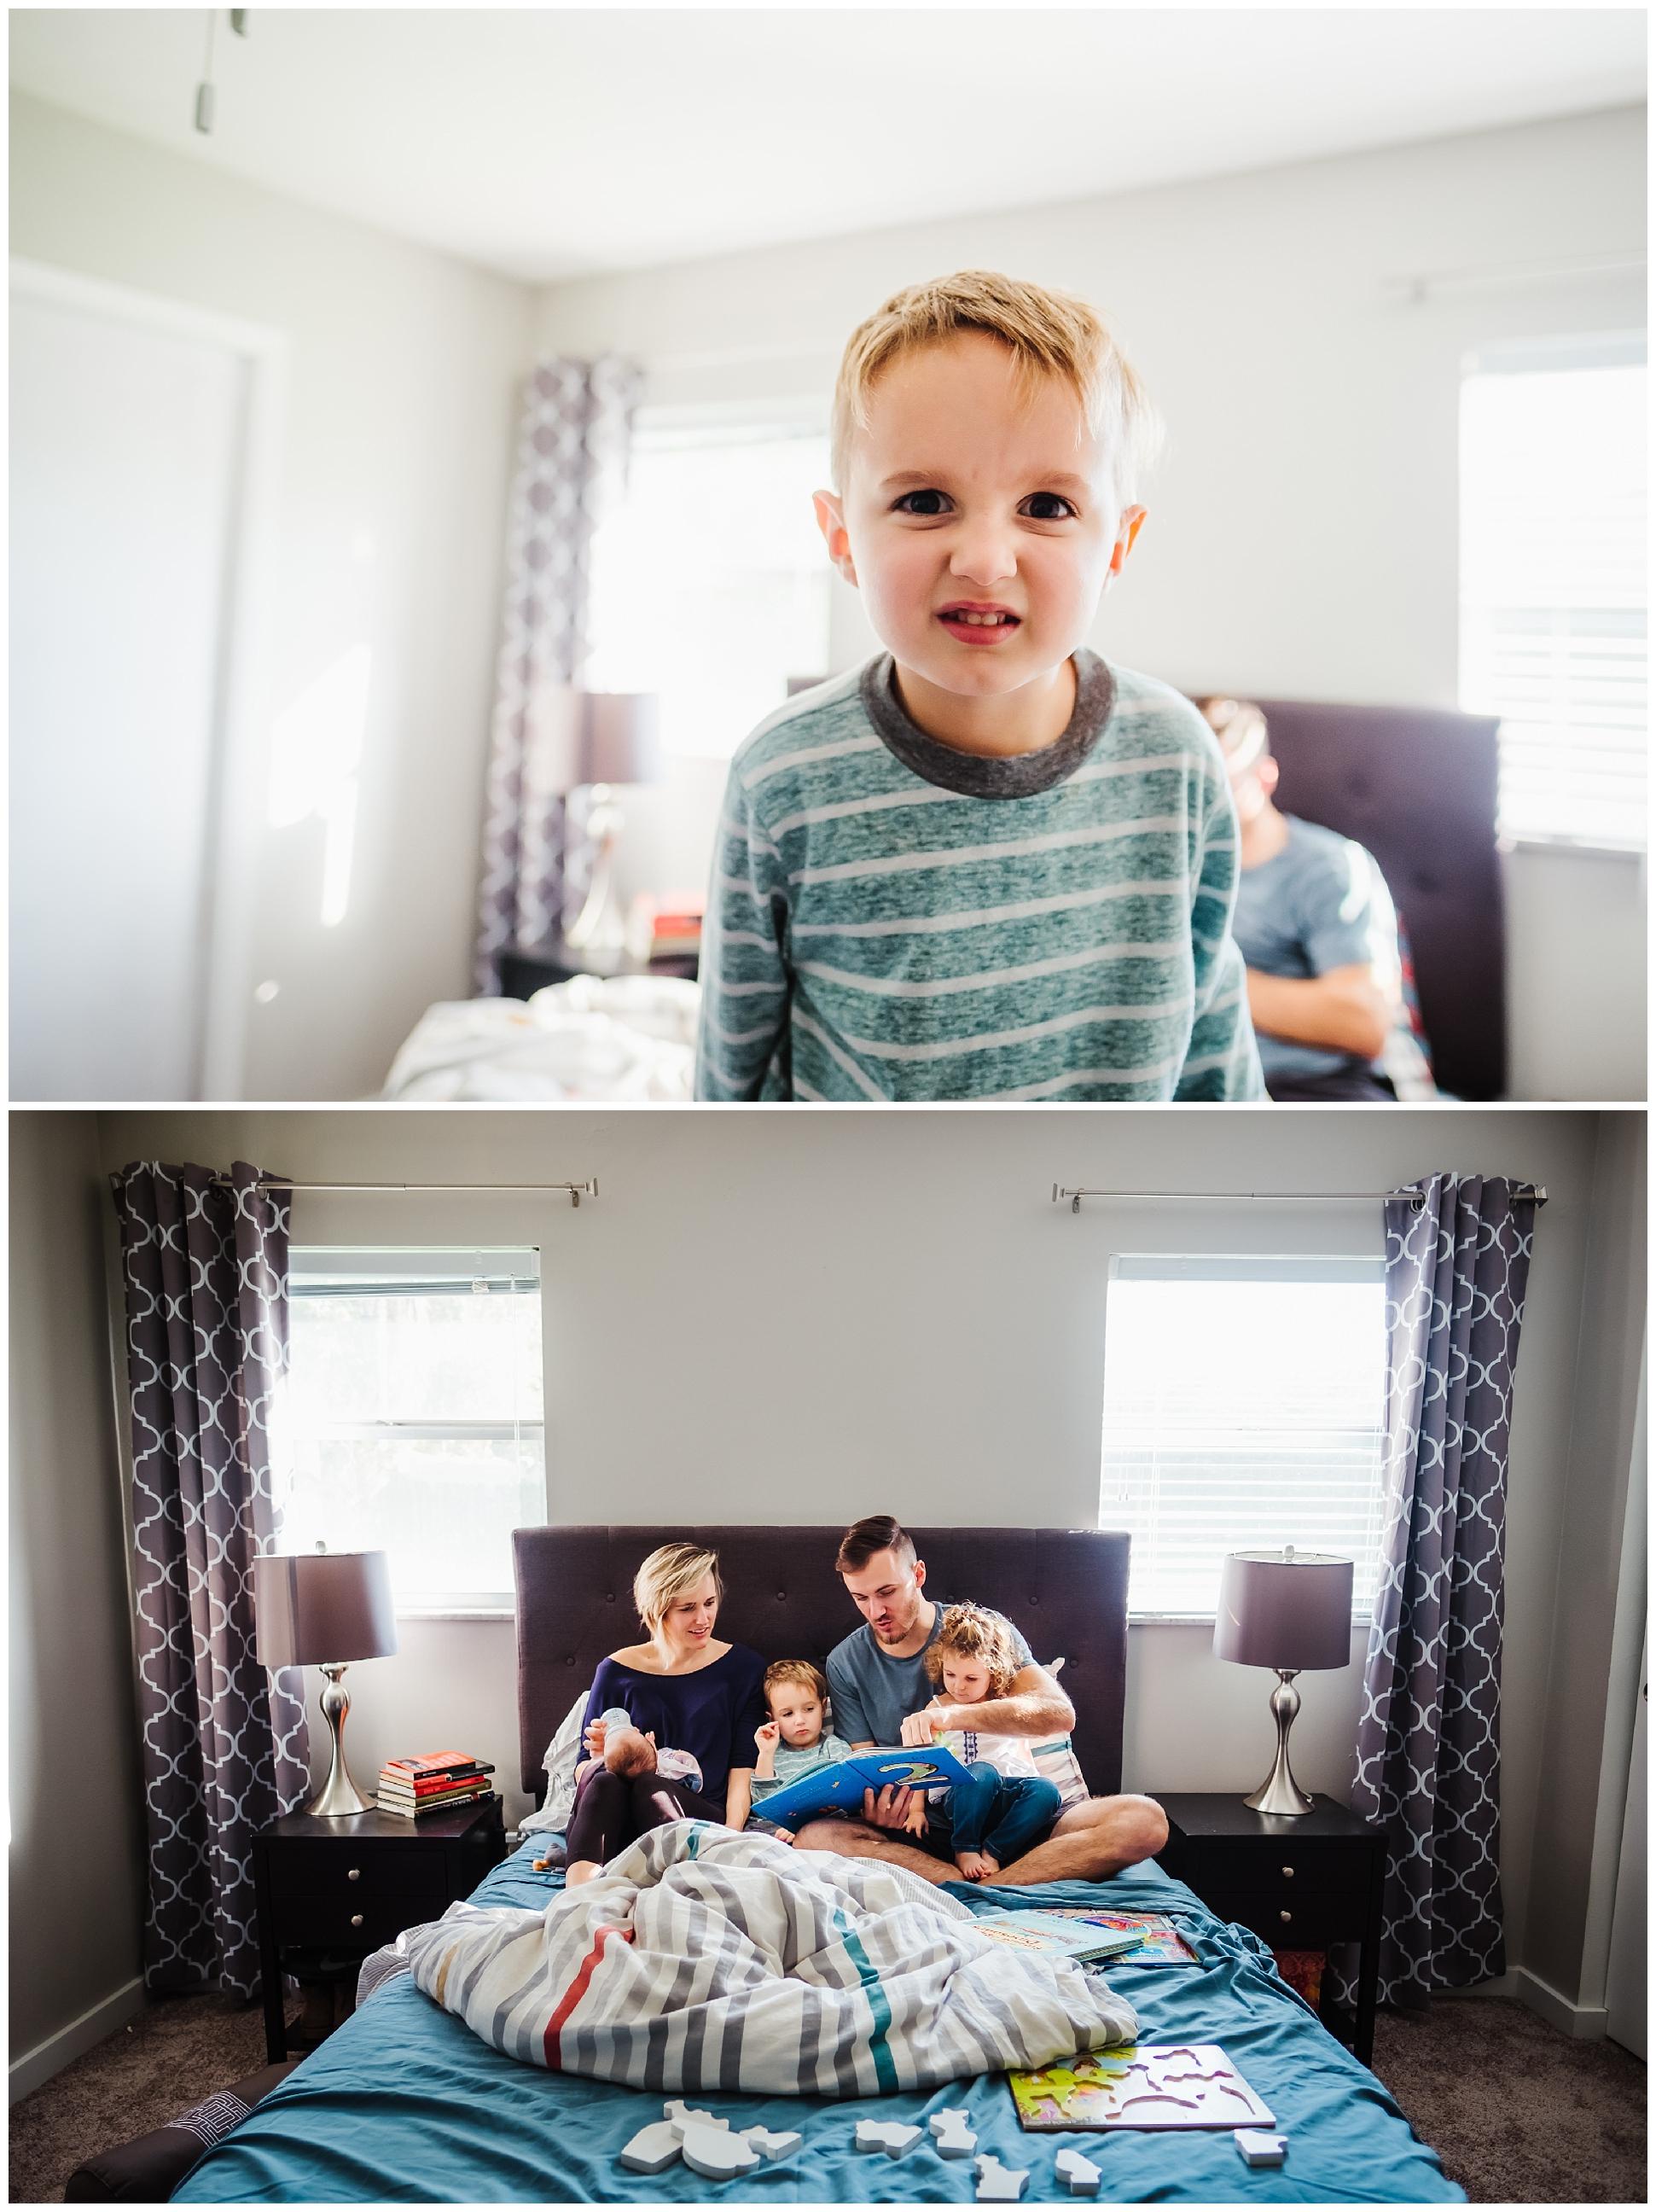 tampa-lifestyle-portrait-photographer-in-home-pentax-film-vs-digital_0009.jpg